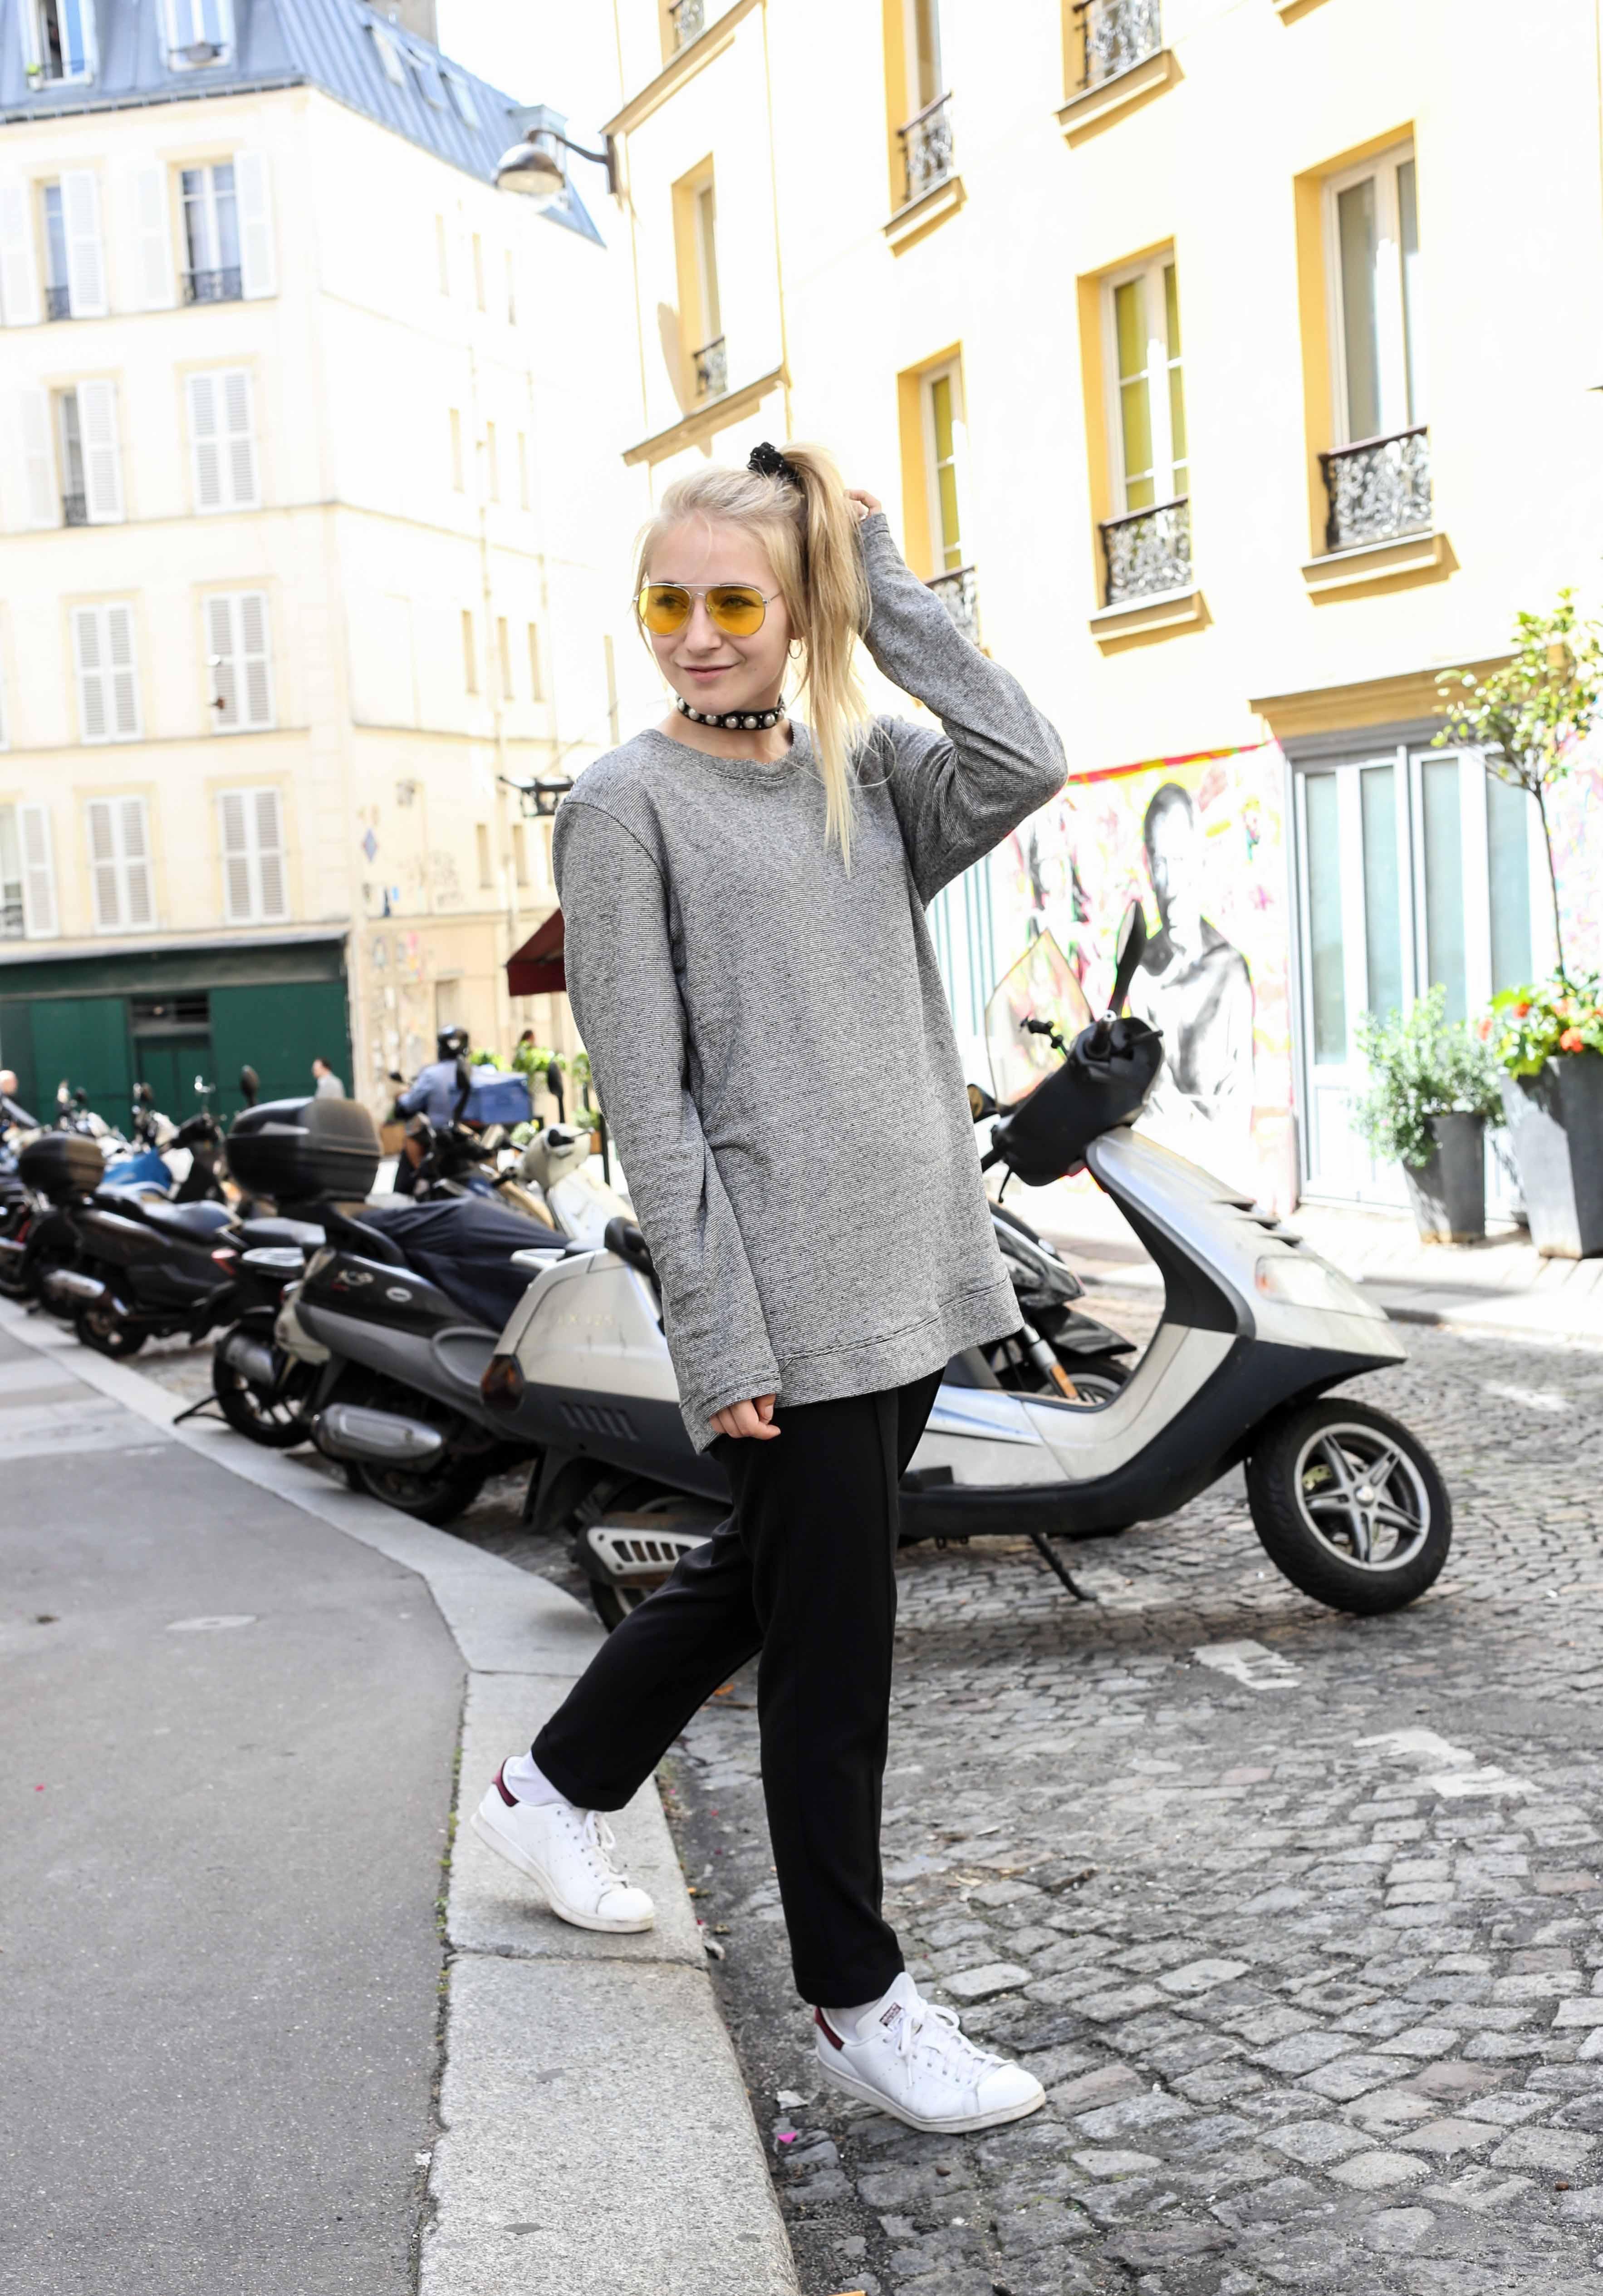 streetstyle-look-paris-loose-fit-hose-boyfriend-sweater-modeblog-fashionblog_2409